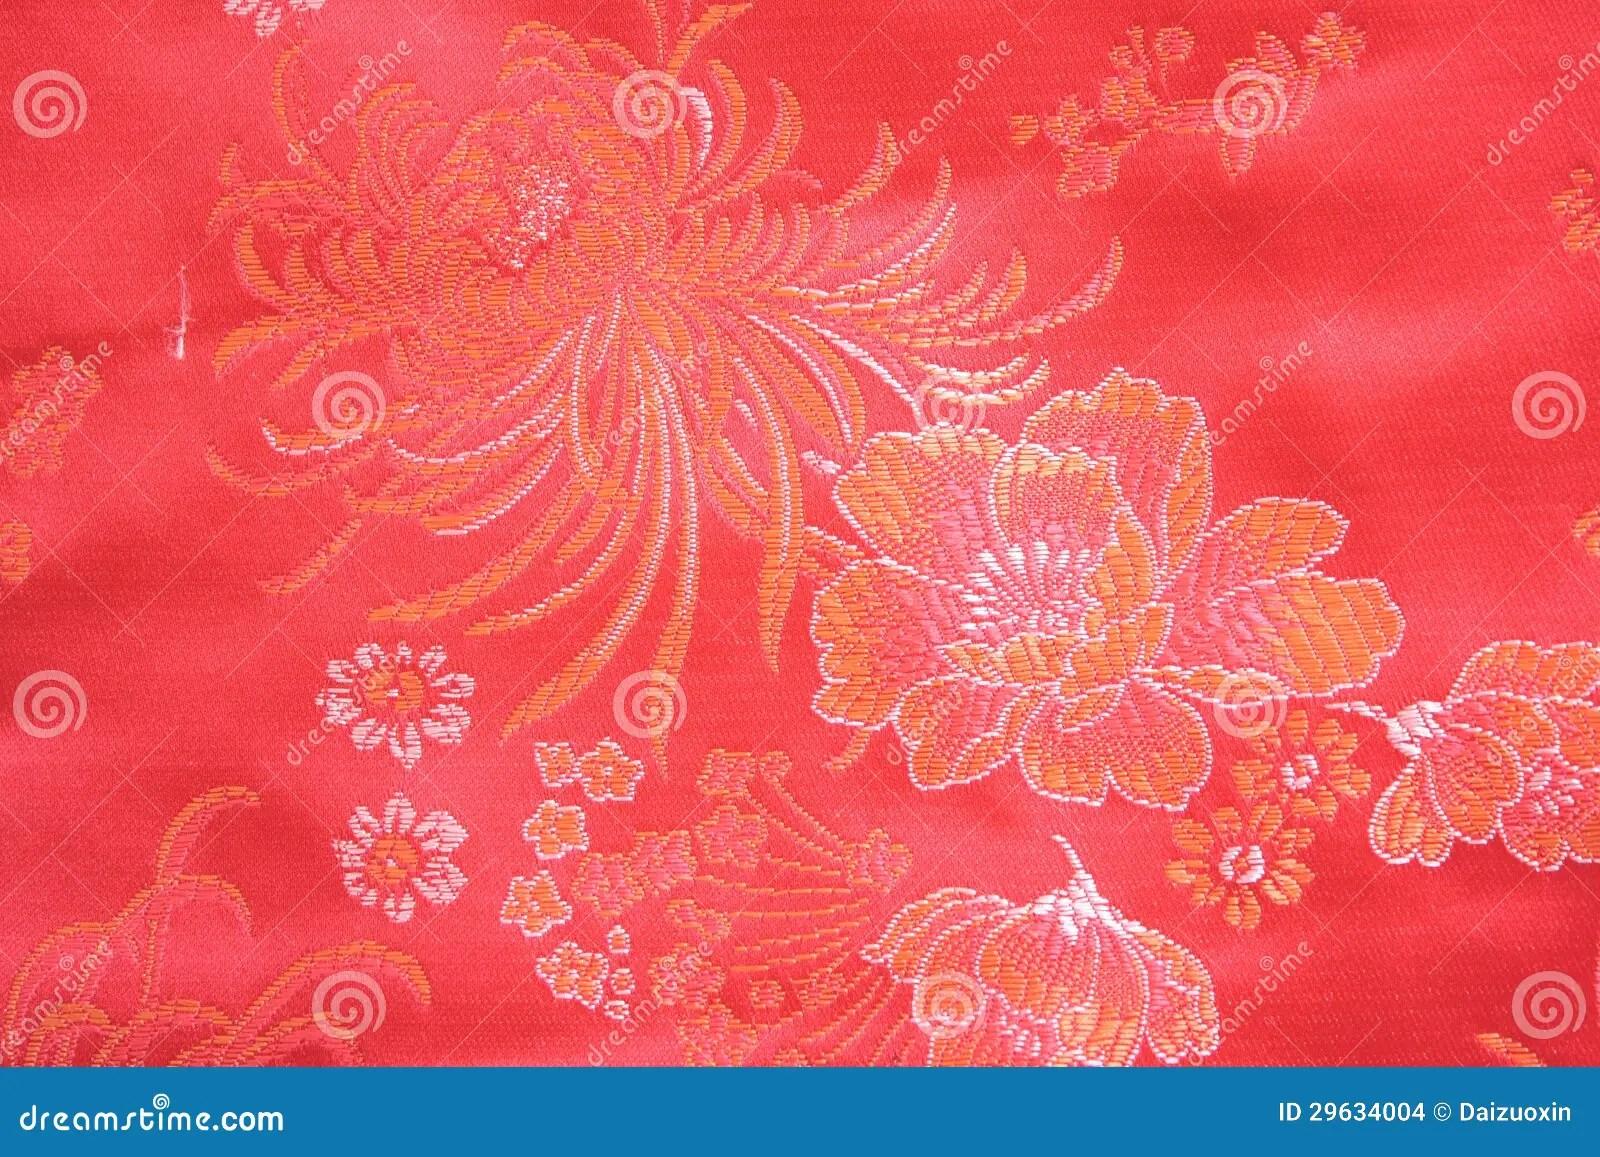 Beautiful Chinese Clothing